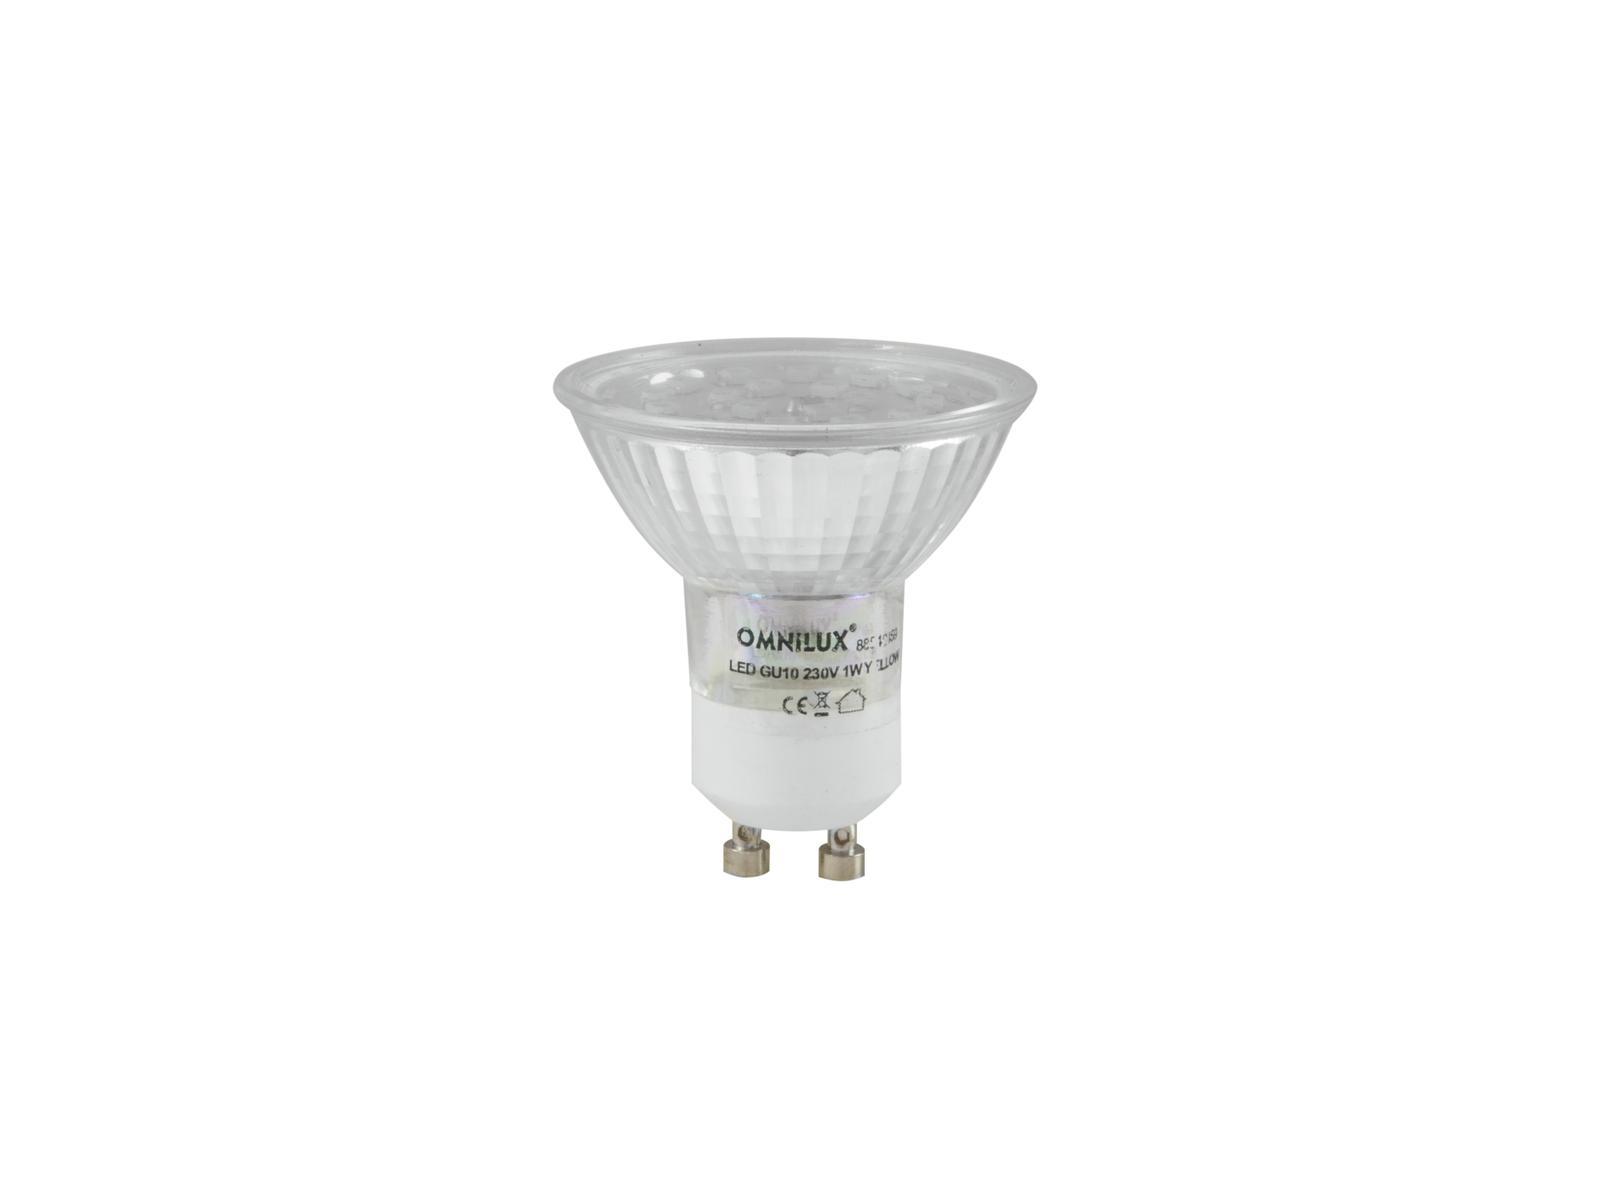 Lampada a led rosso GU-10 230V 18 OMNILUX